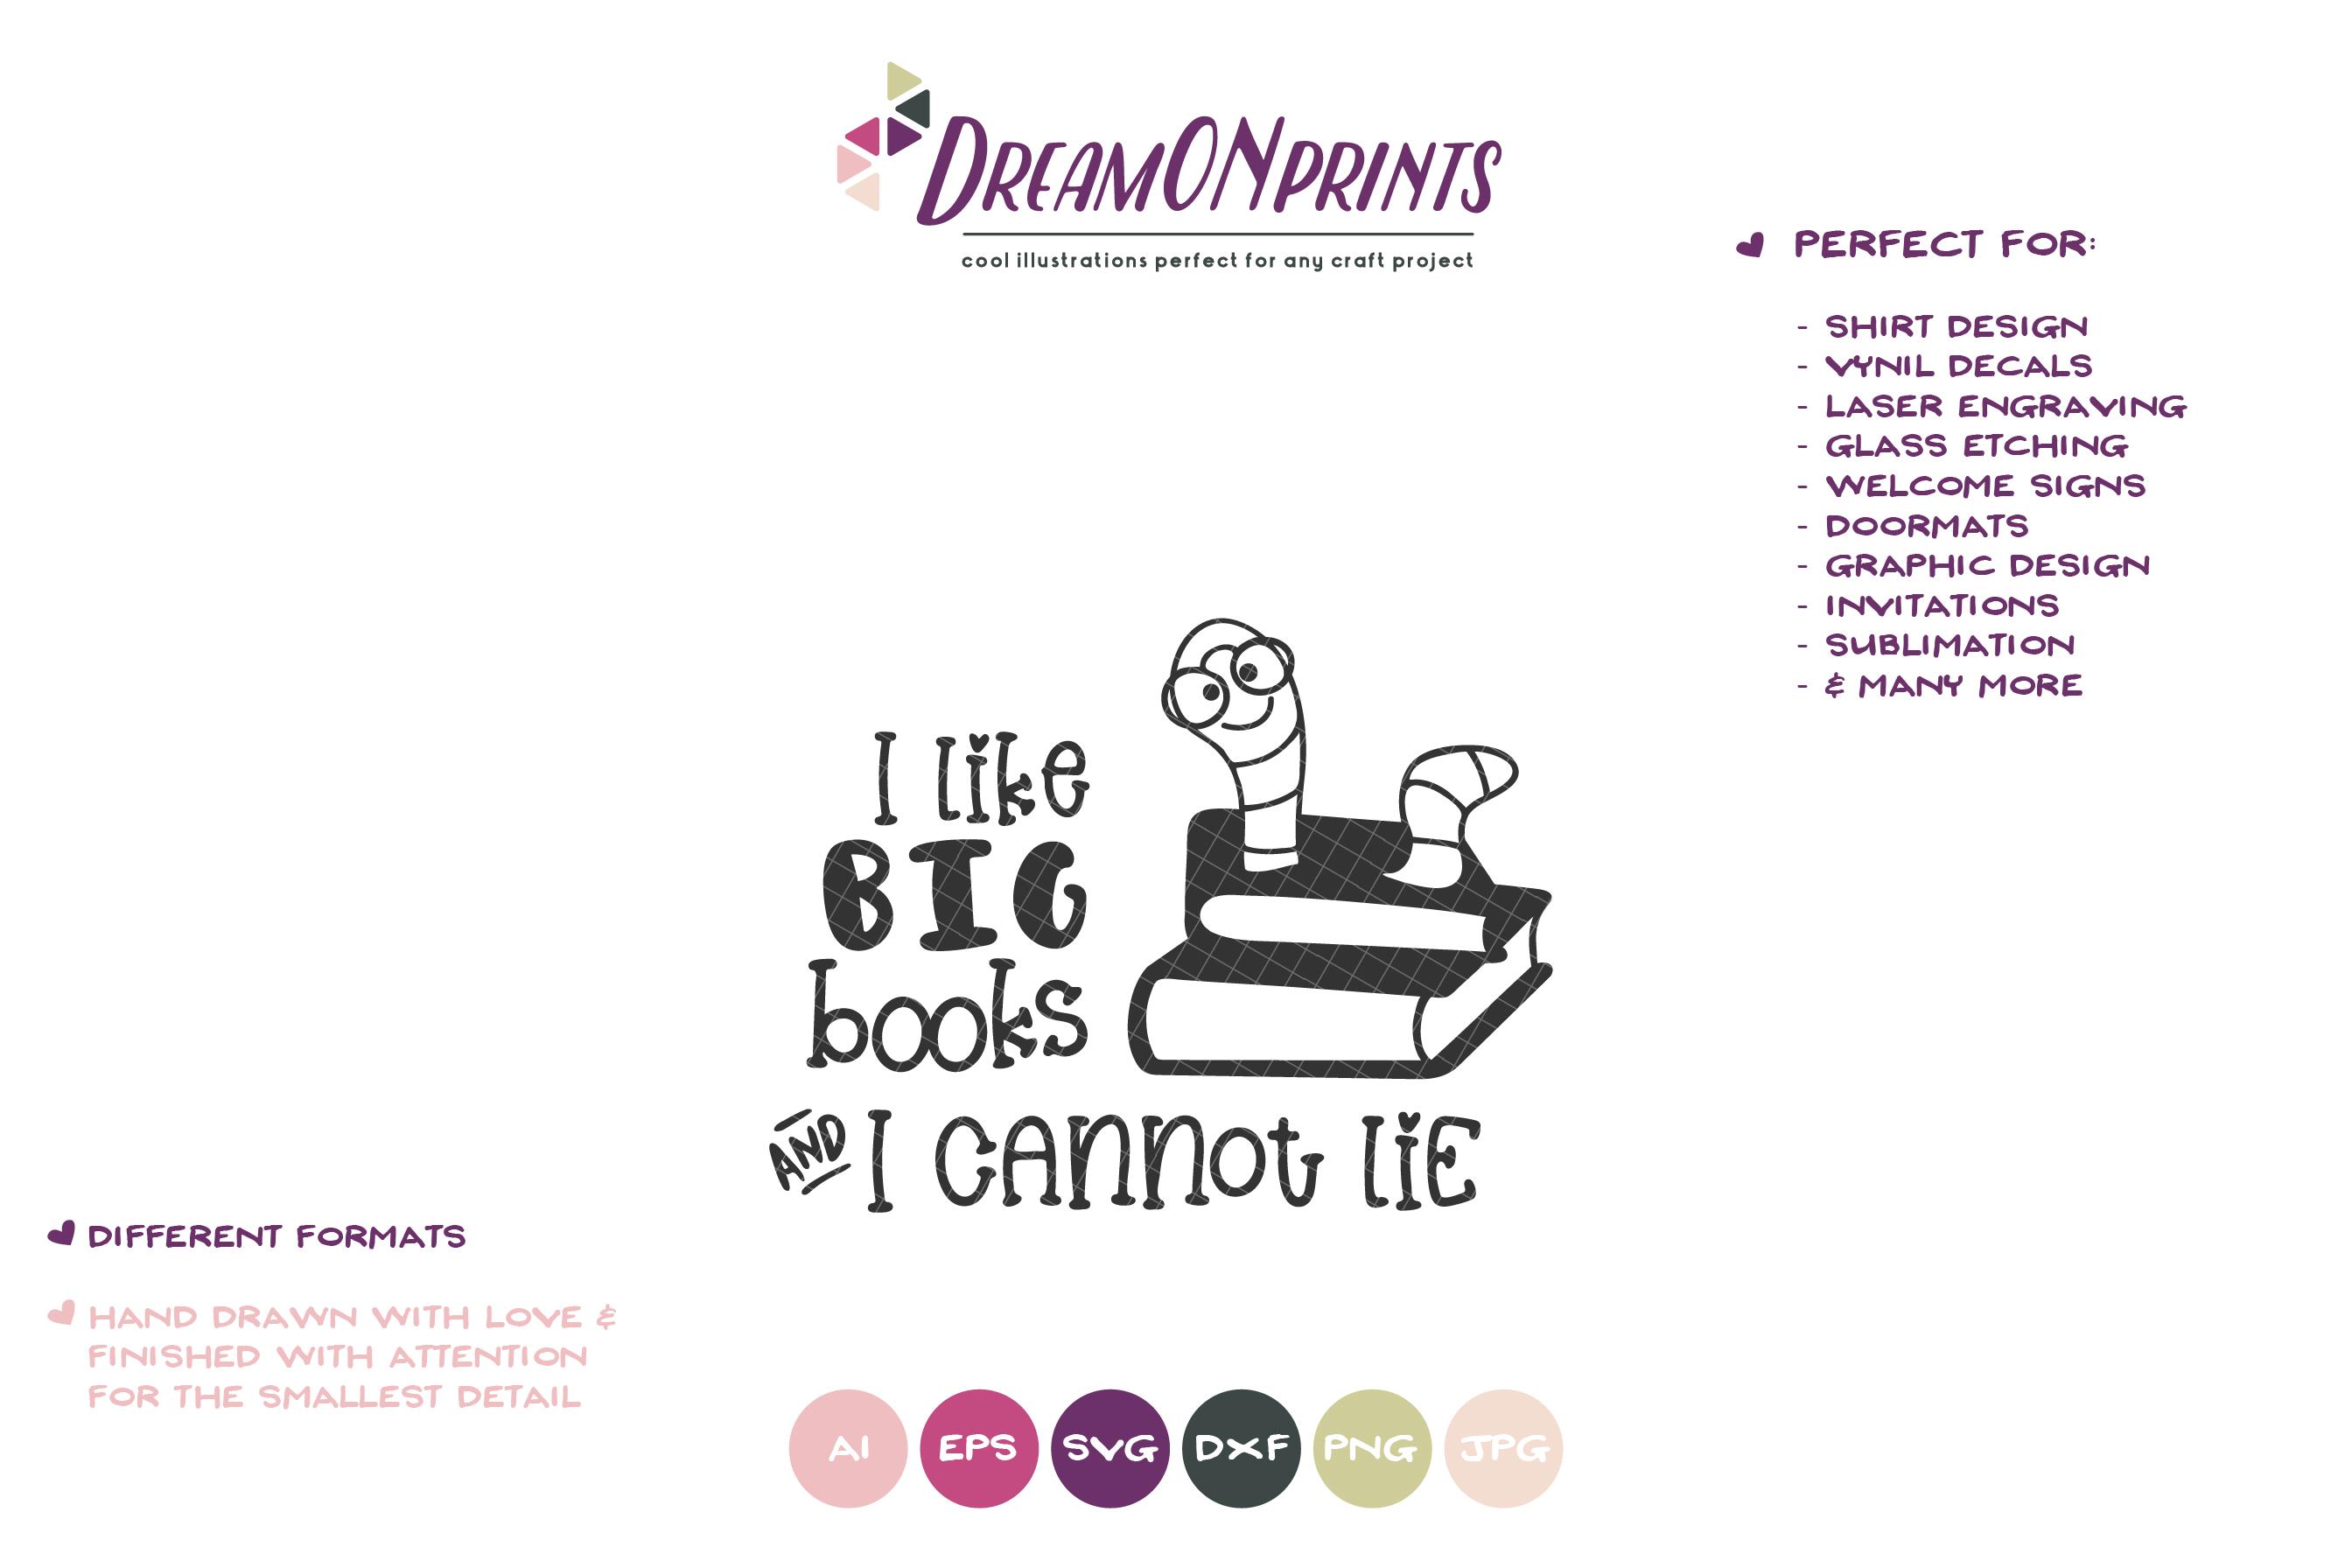 I Like Big Books | Bookworm SVG | Funny Reading SVG Design example image 2